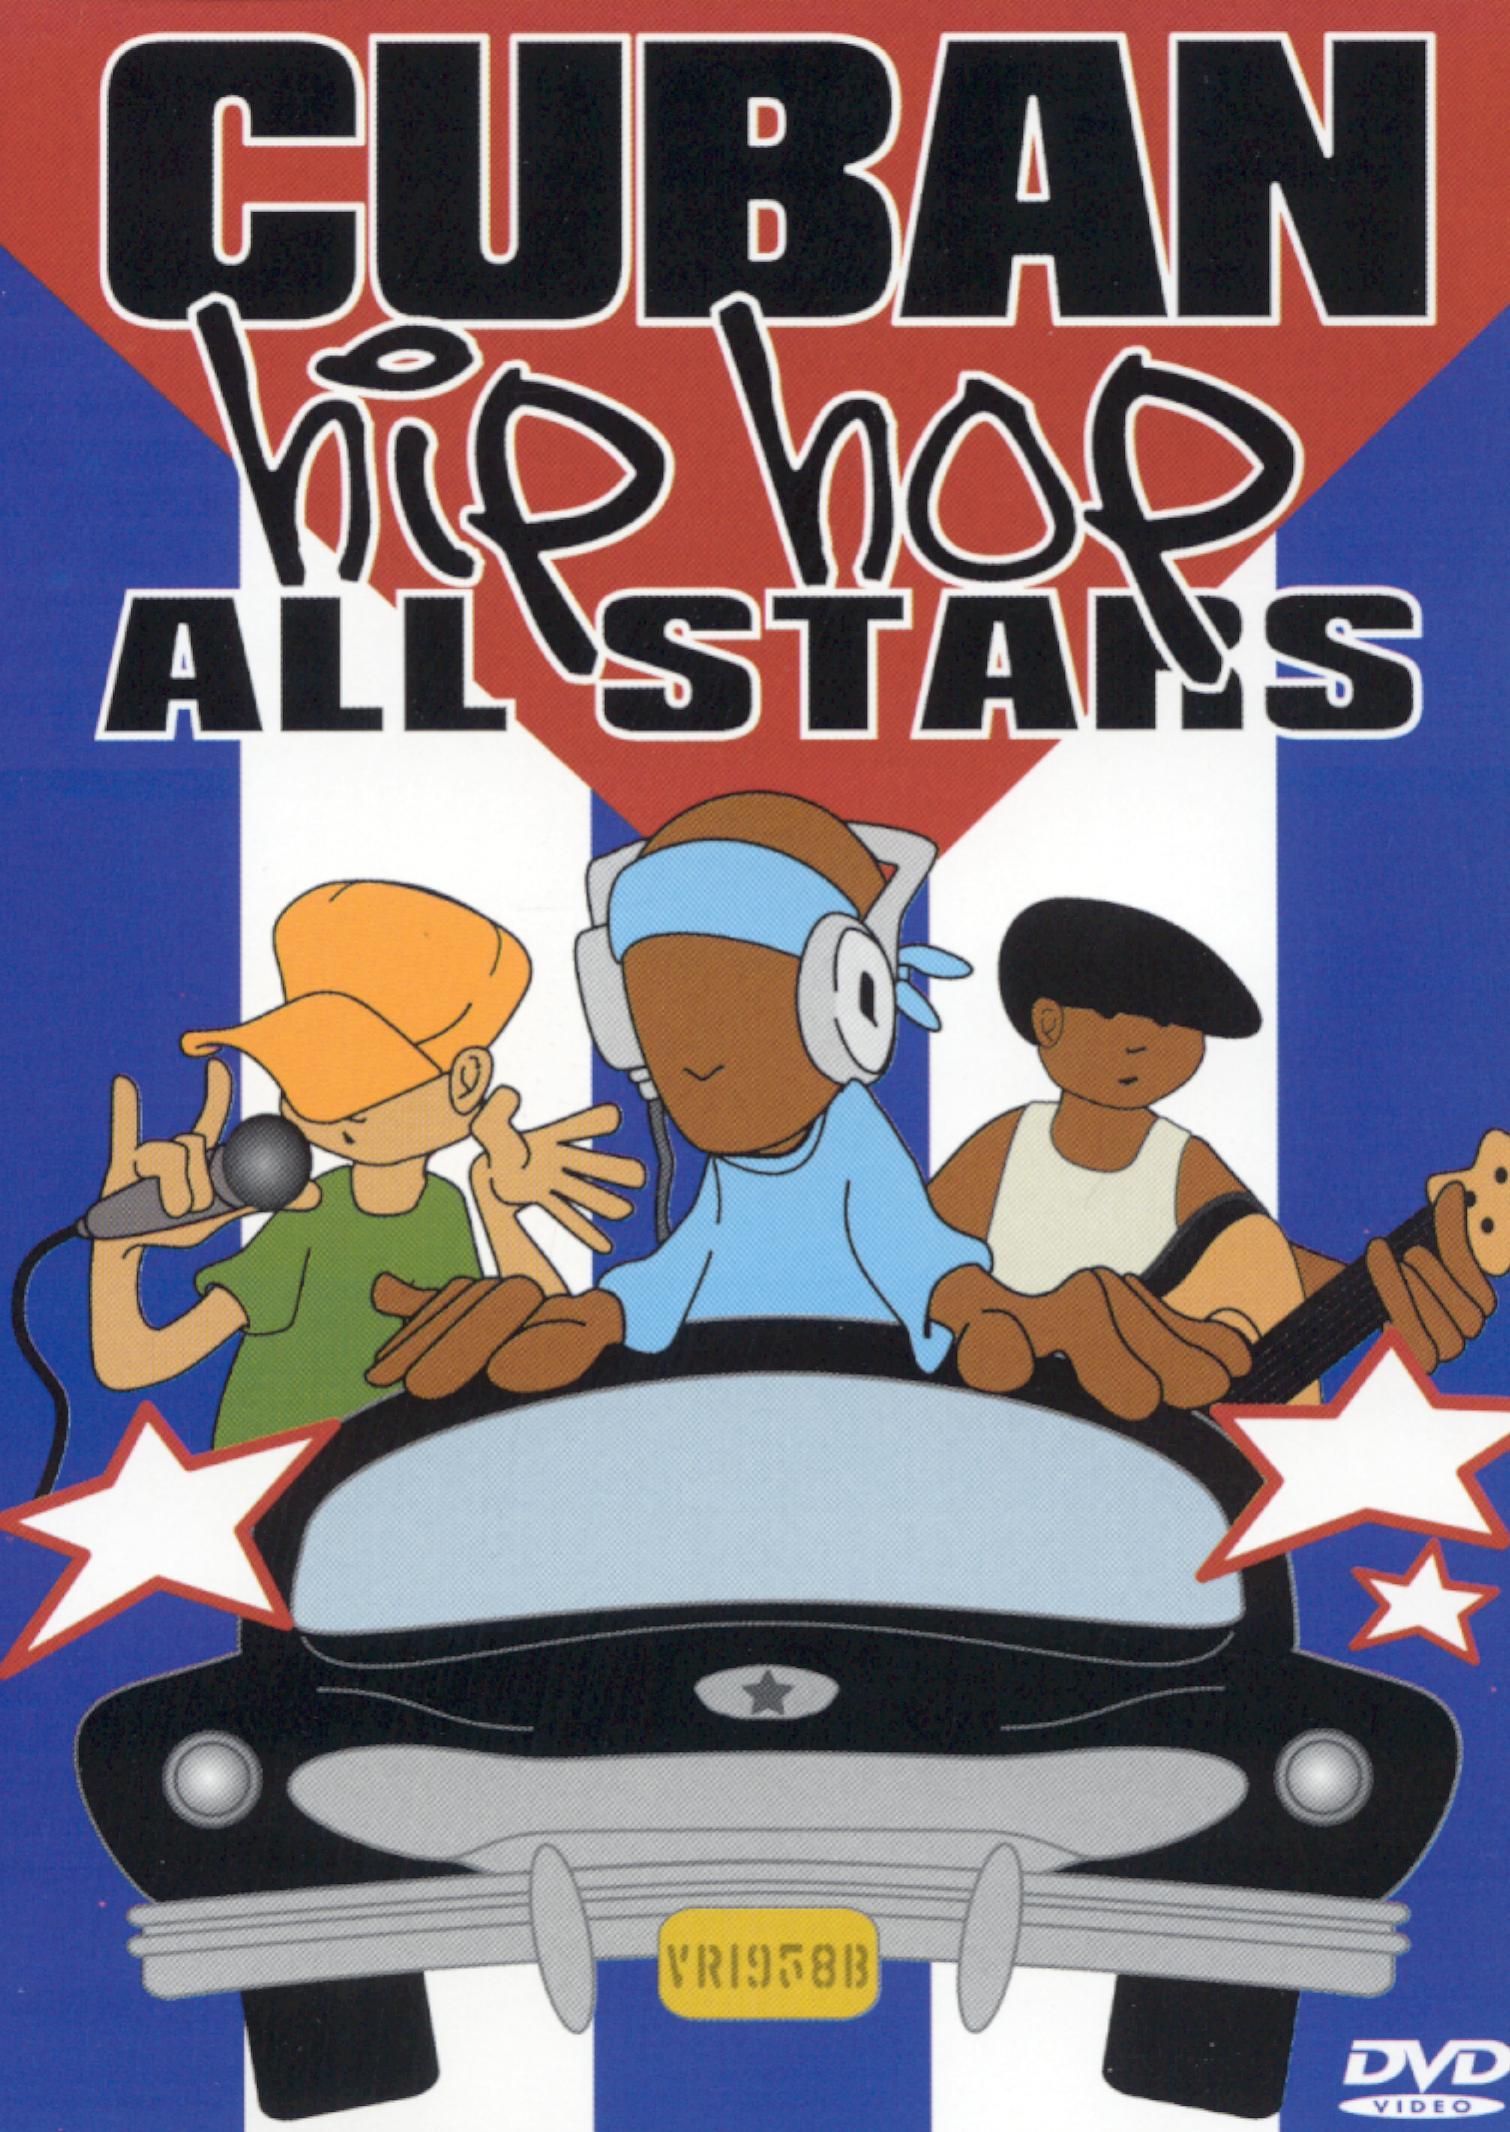 Cuban Hip Hop All-Stars